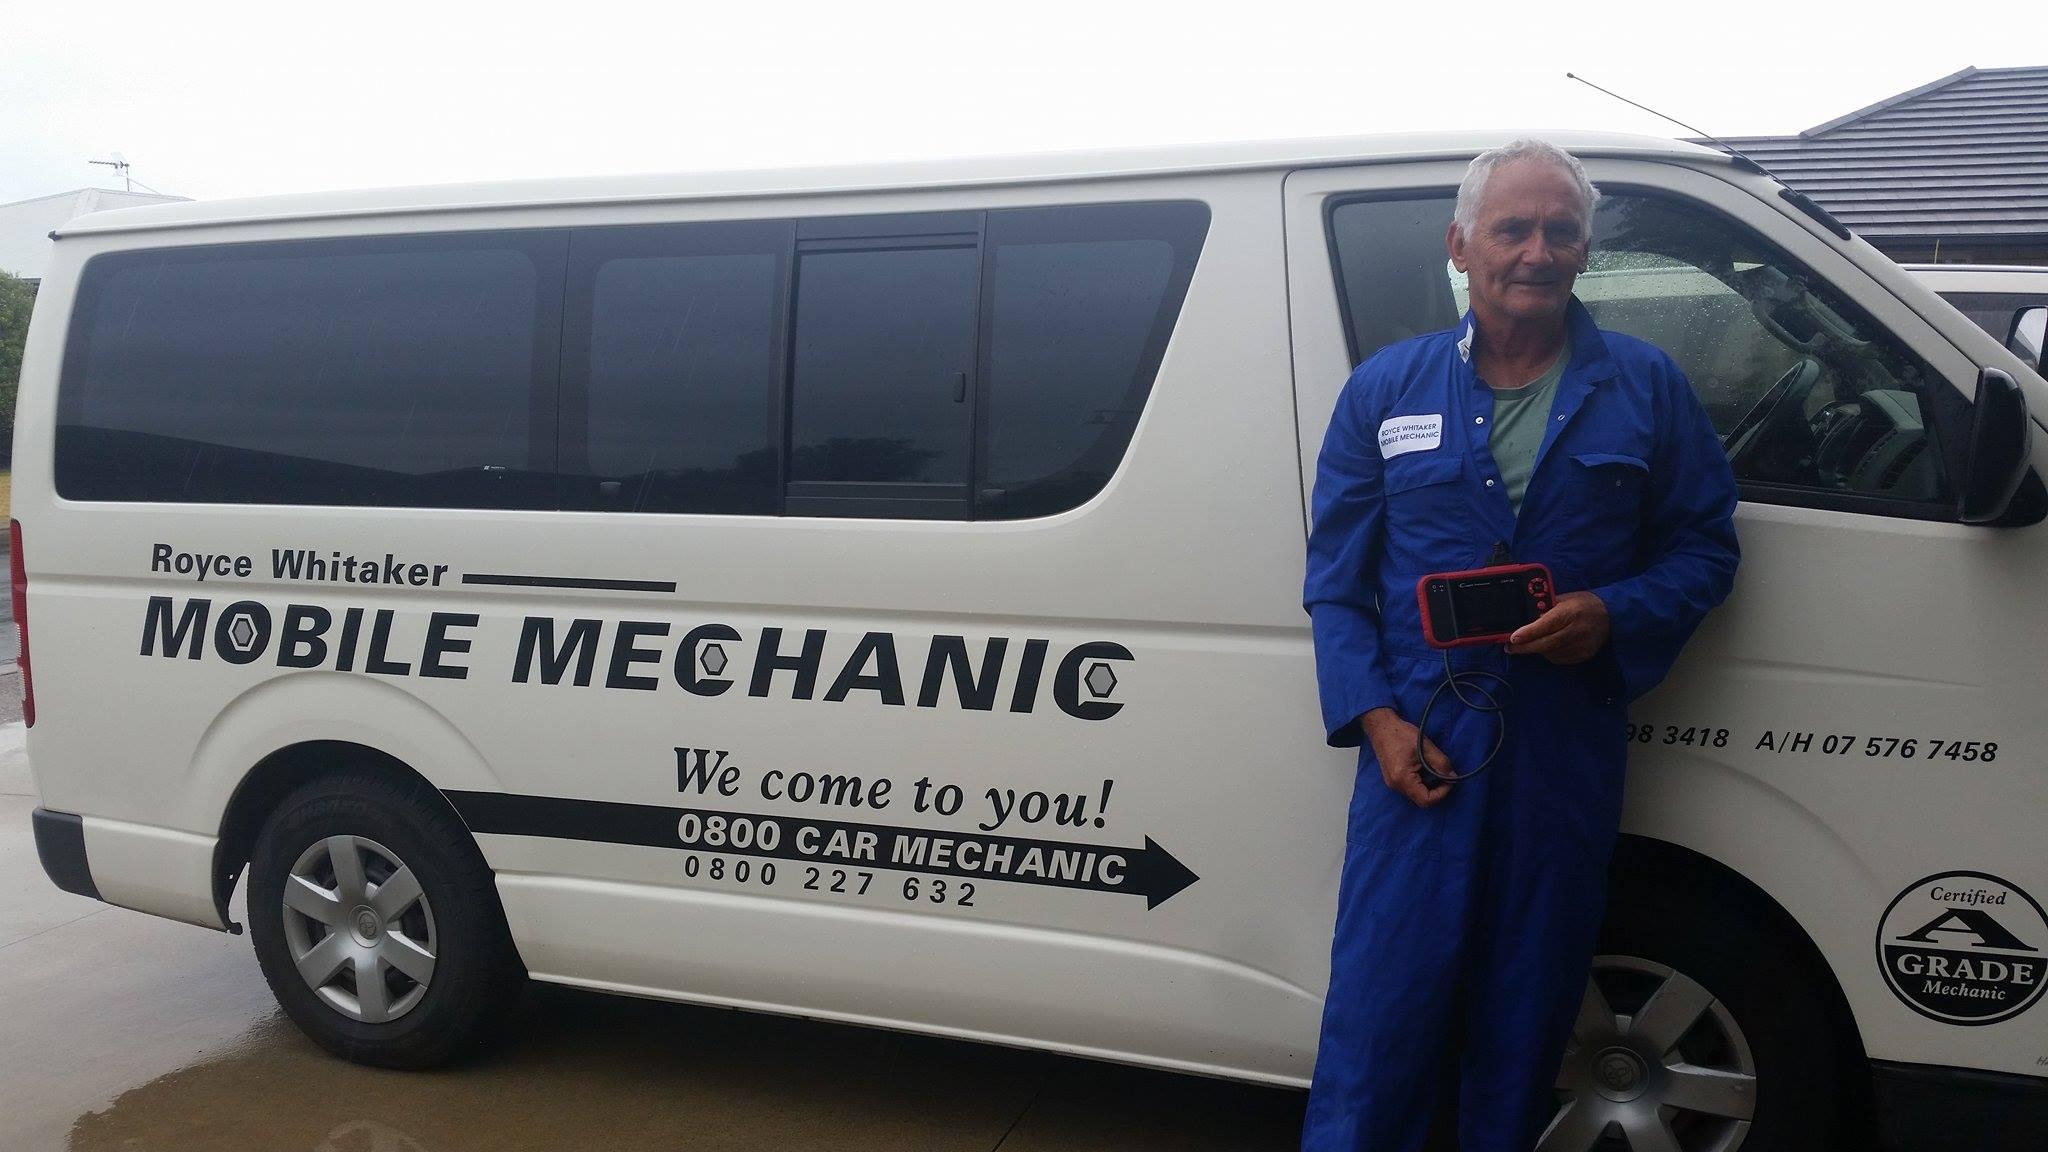 Mobile Mechanic Tauranga - Mobile Mechanic Tauranga